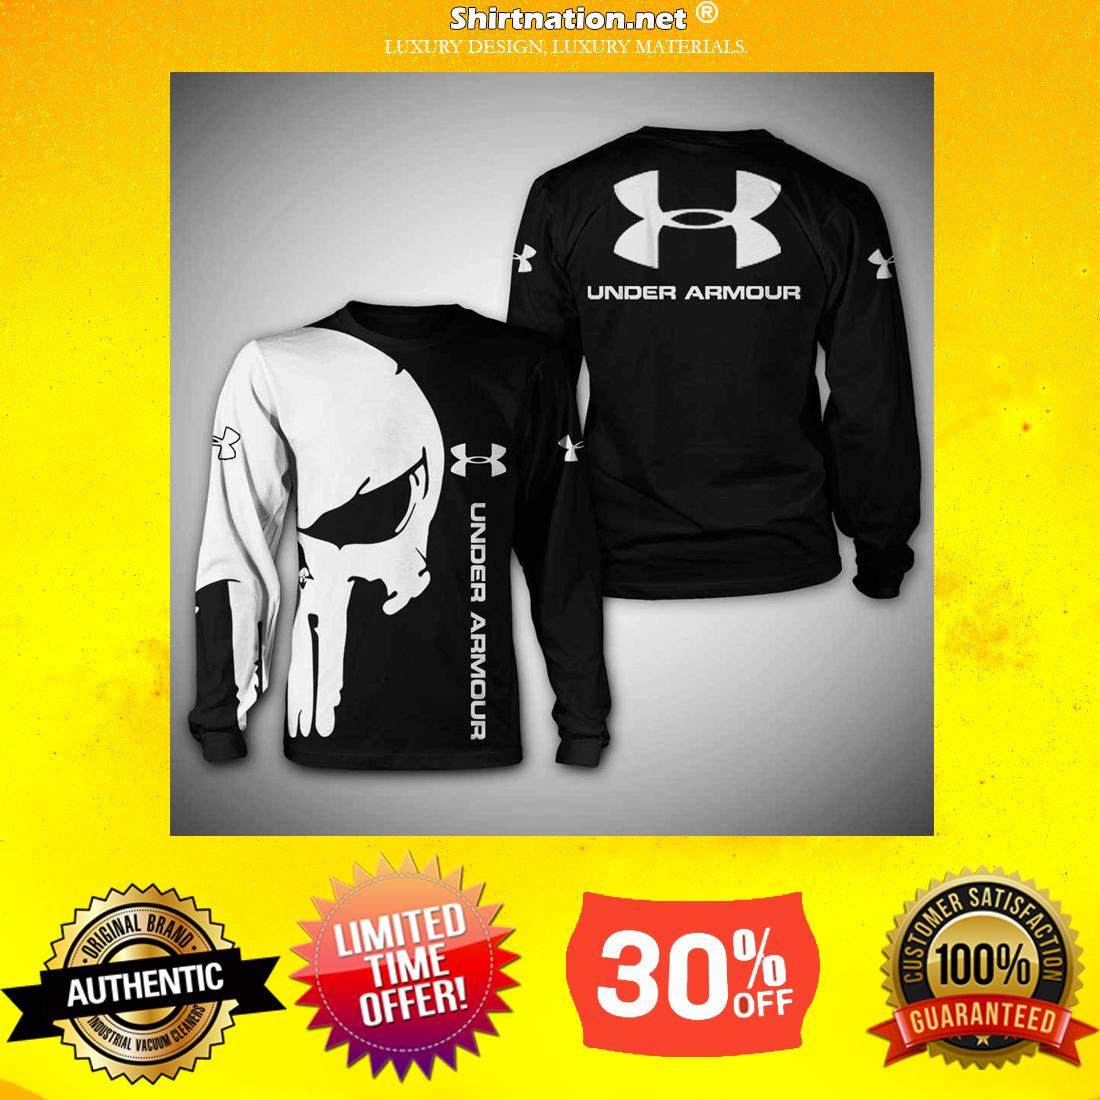 Punisher Skull Under Armour 3d shirt and sweatshirt